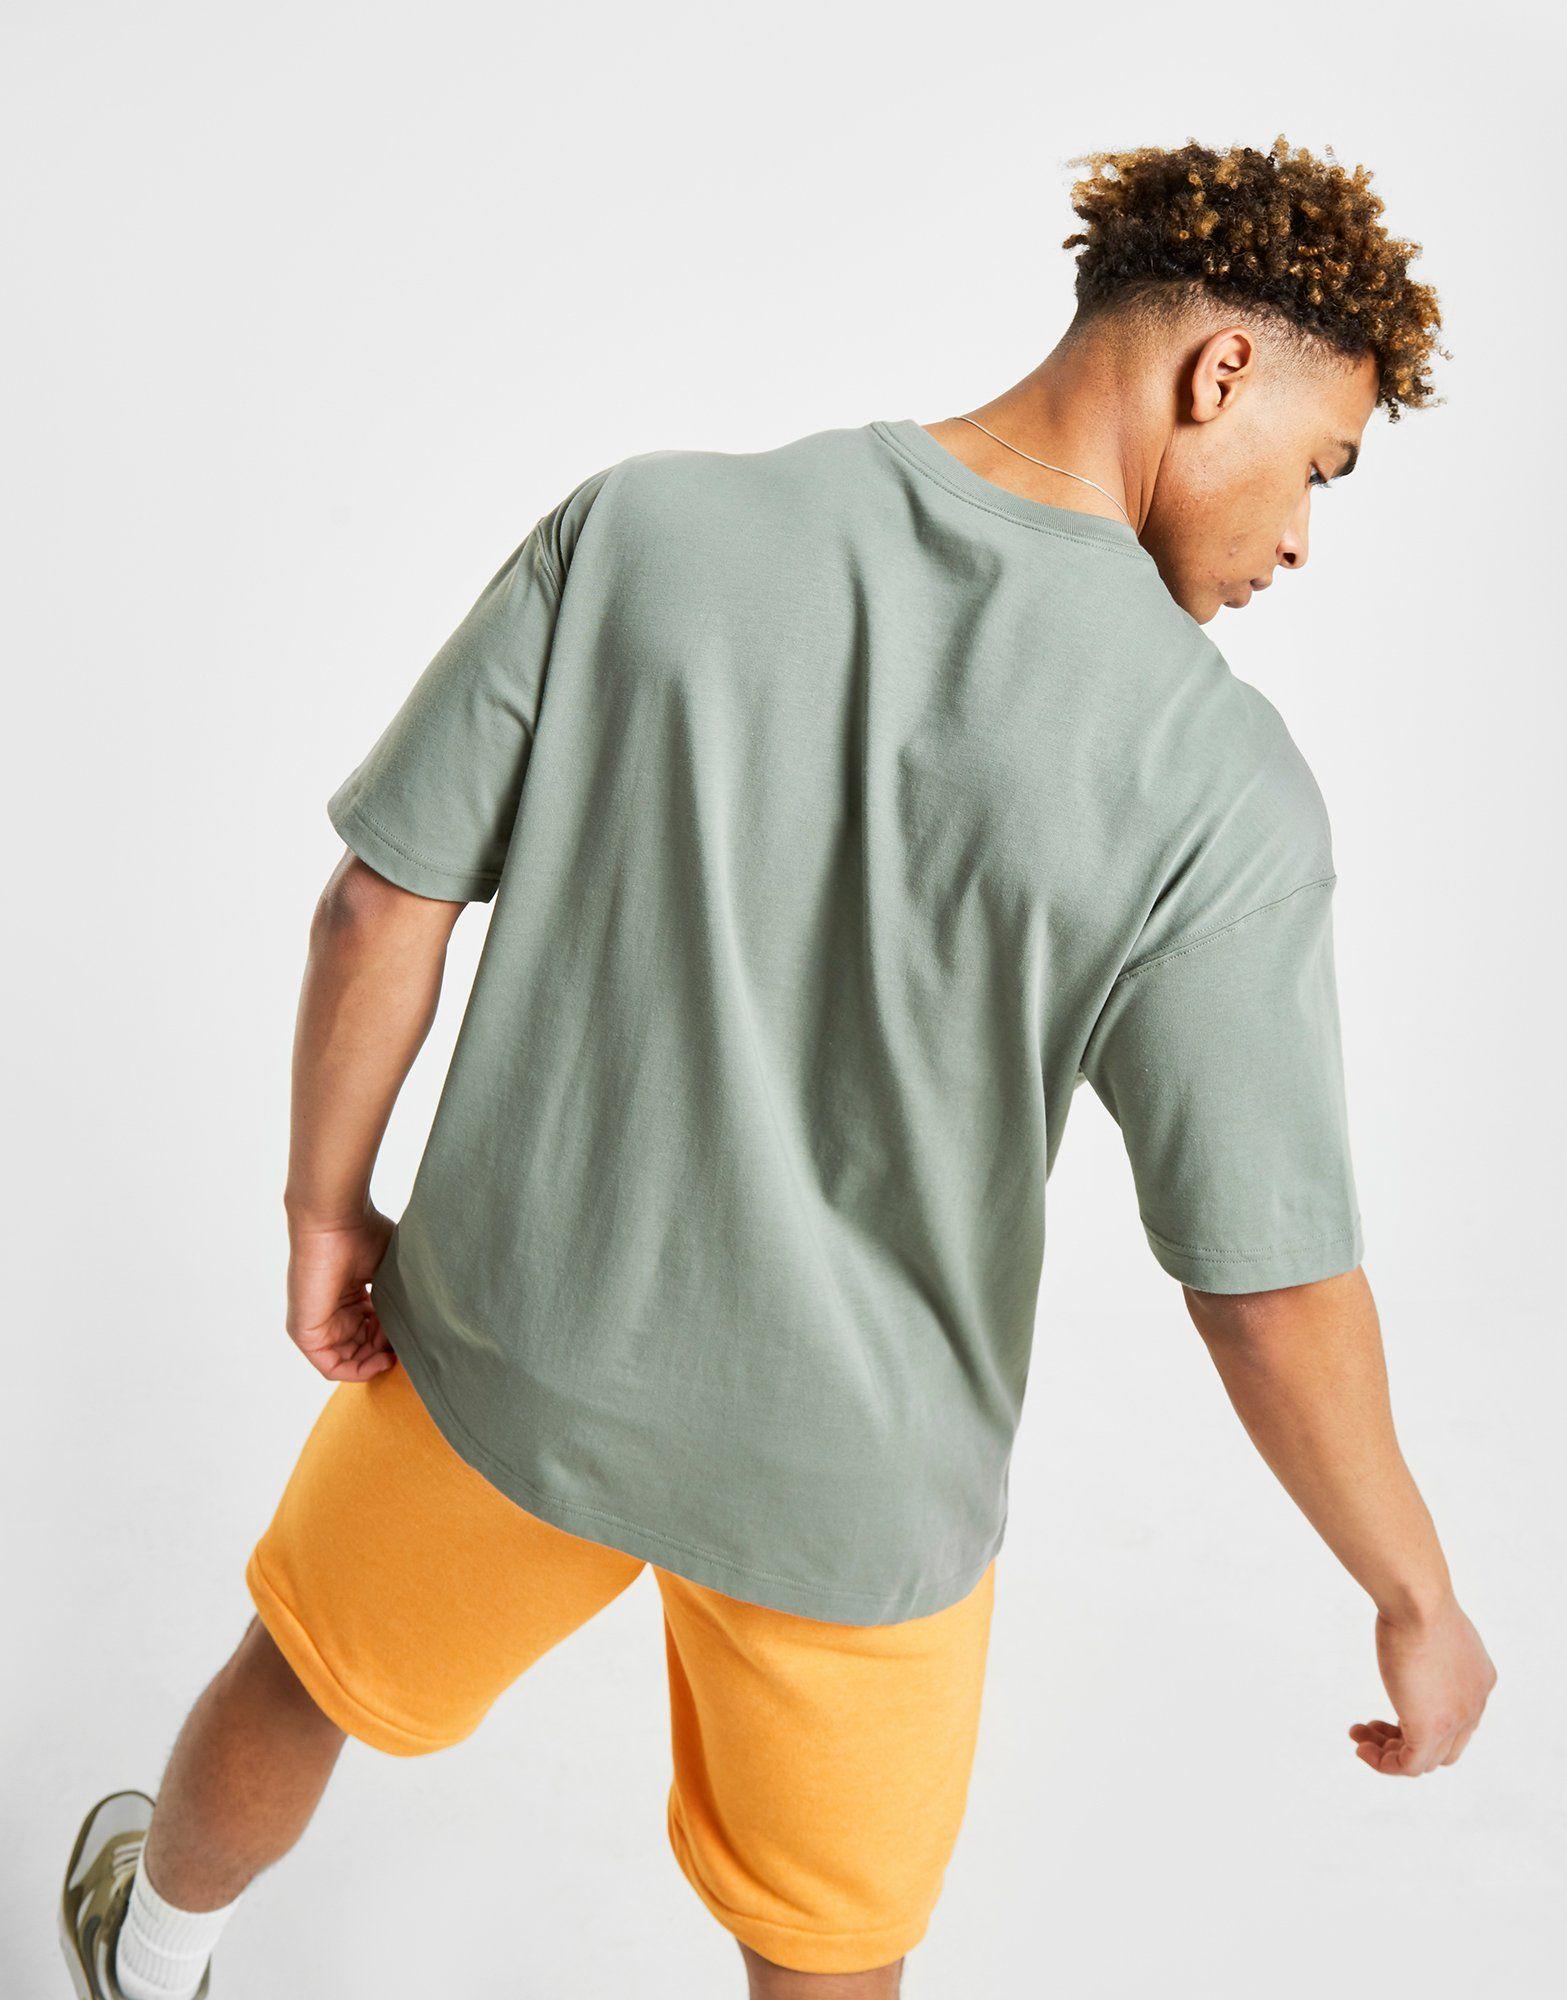 Nike Outline T-Shirt